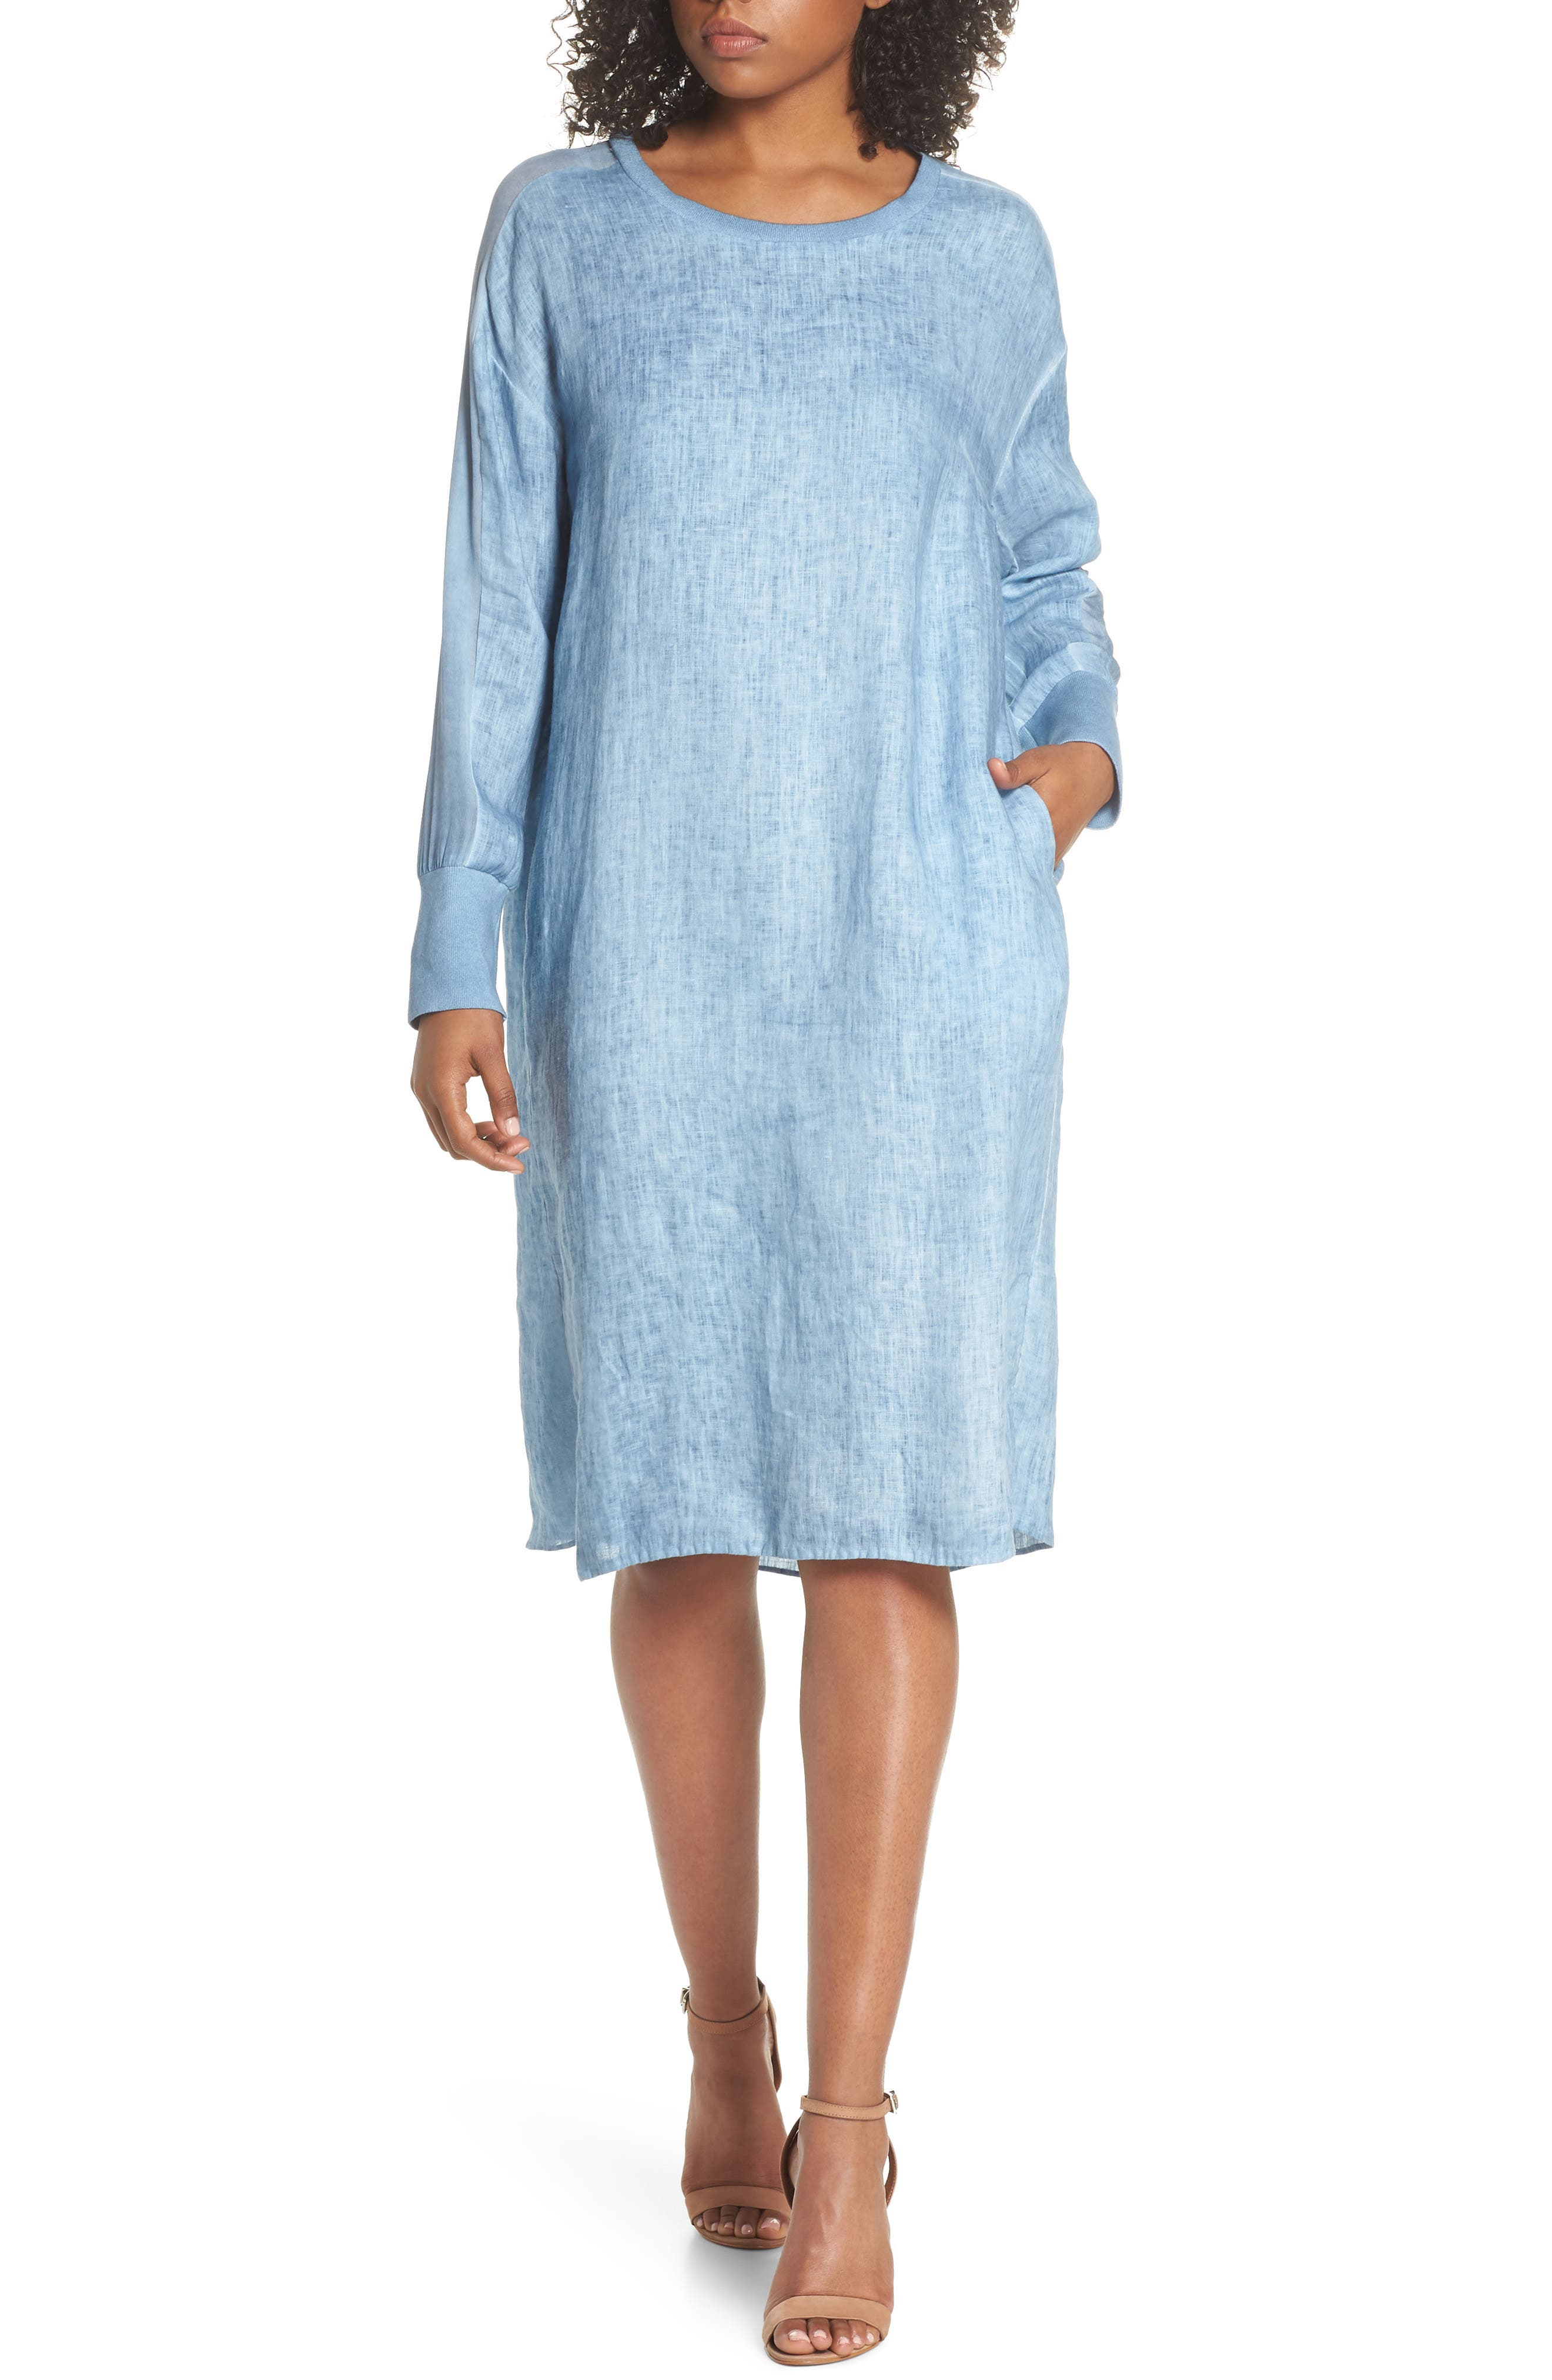 Rata Linen Shift Dress,                             Main thumbnail 1, color,                             Blue